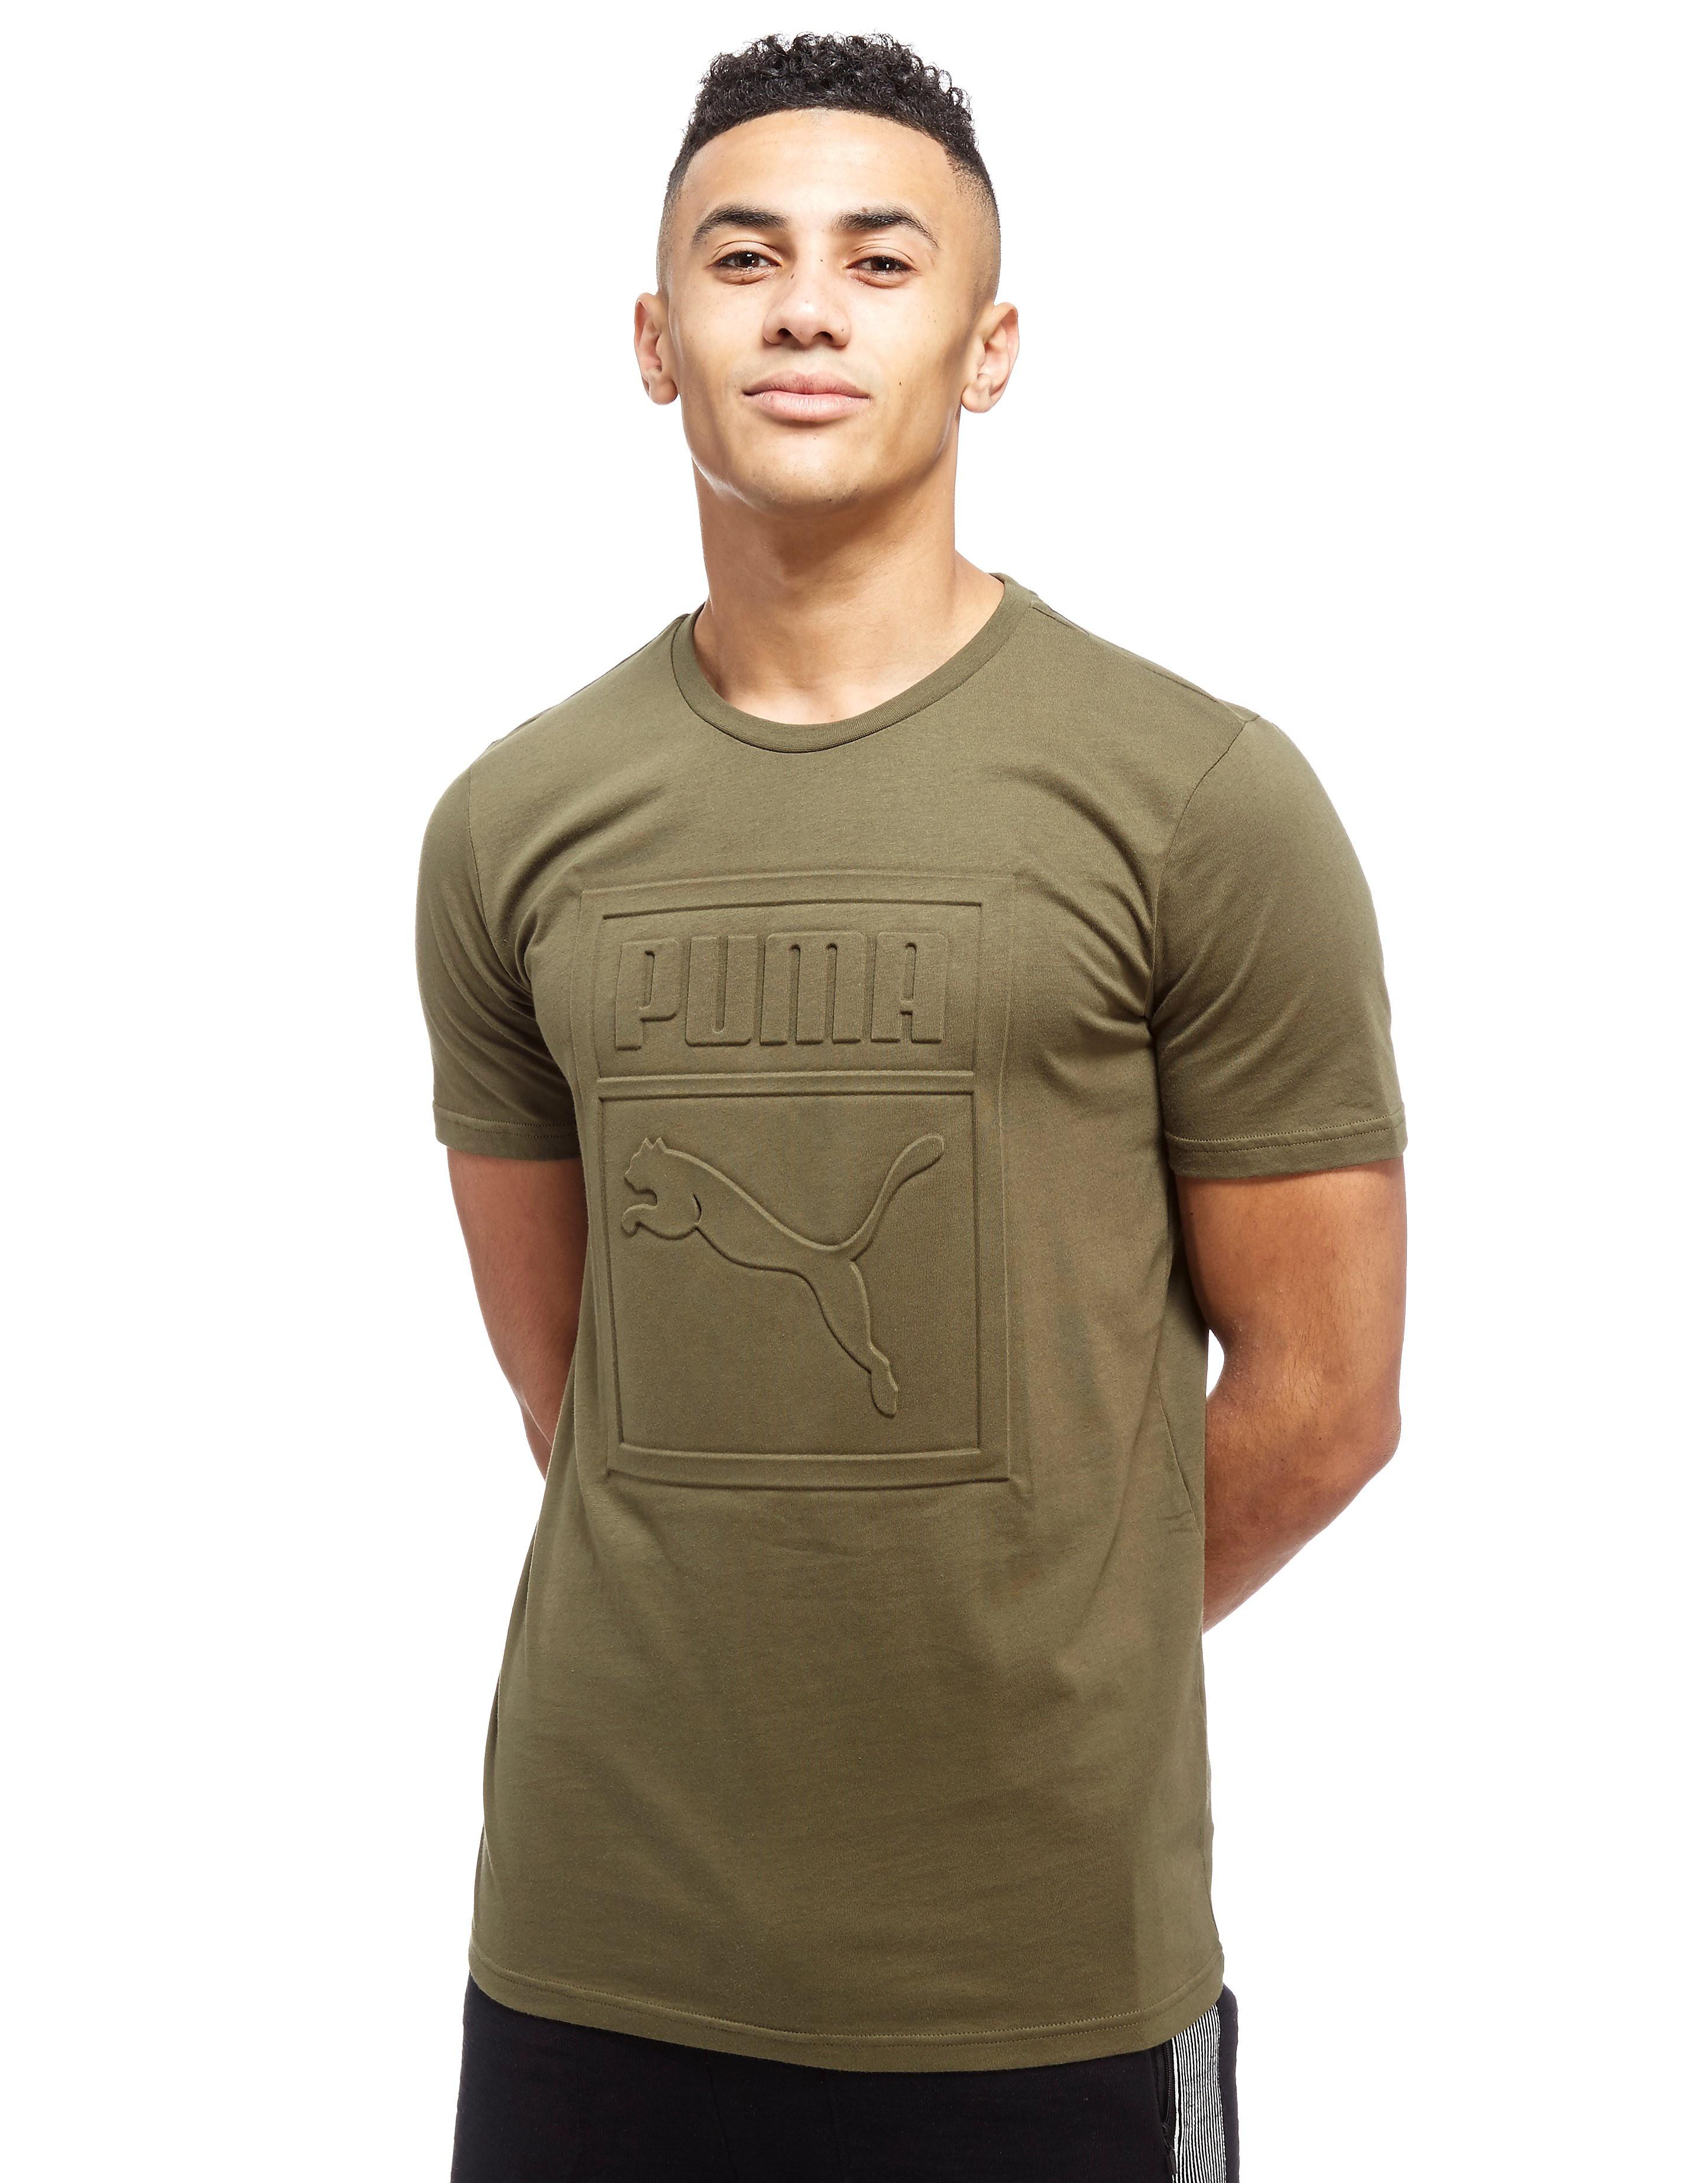 PUMA PUMA en relief Logo T-Shirt